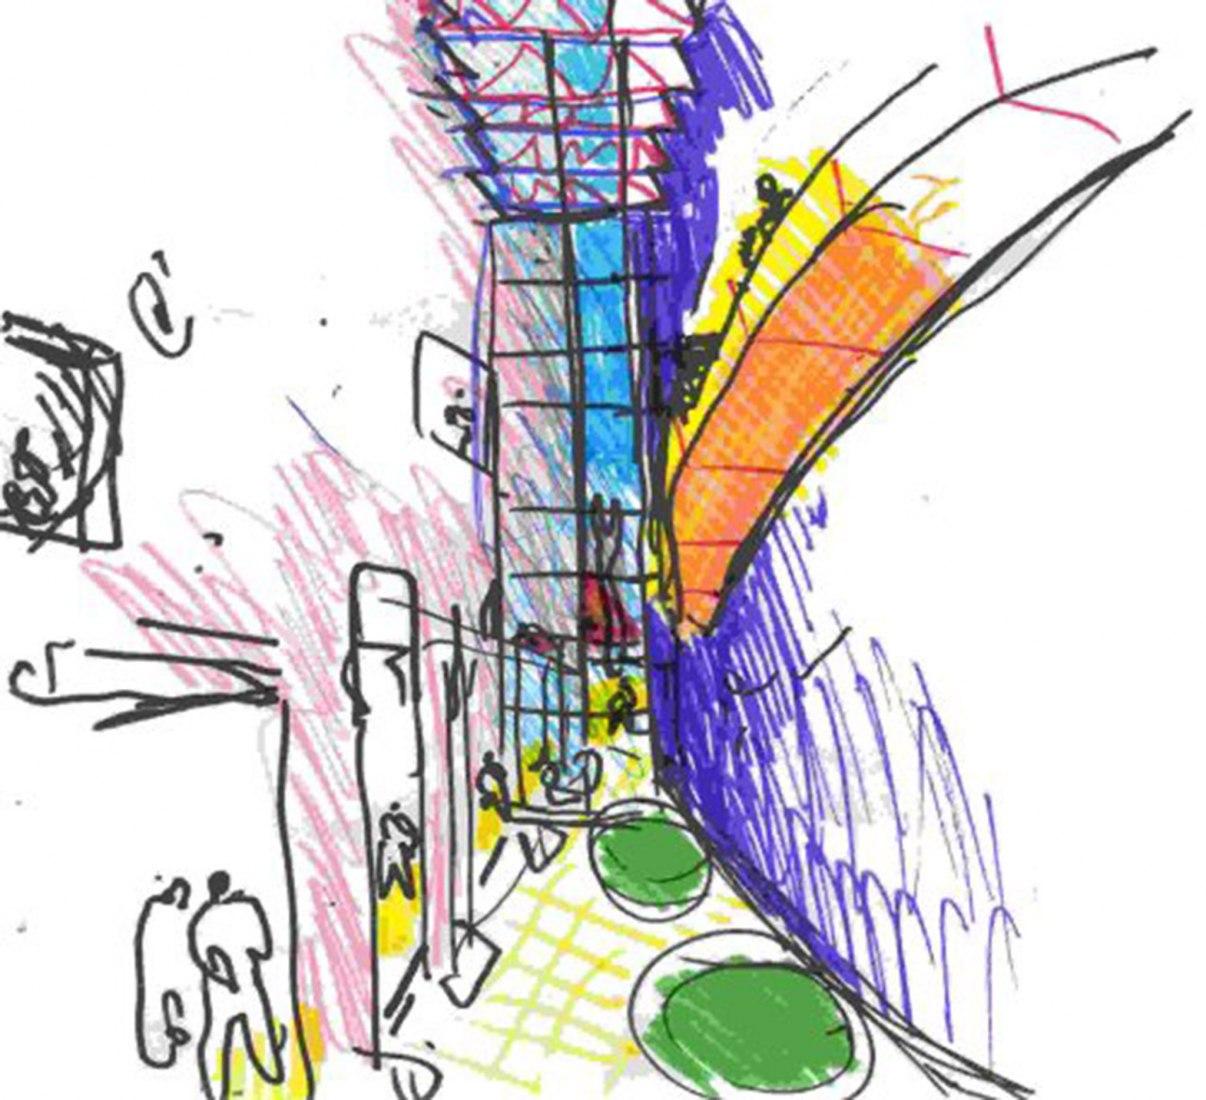 Sketch of the Konex Cultural City by Clorindo Testa. Konex Cultural City by Clorindo Testa, Juan Fontana and Oscar Lorenti